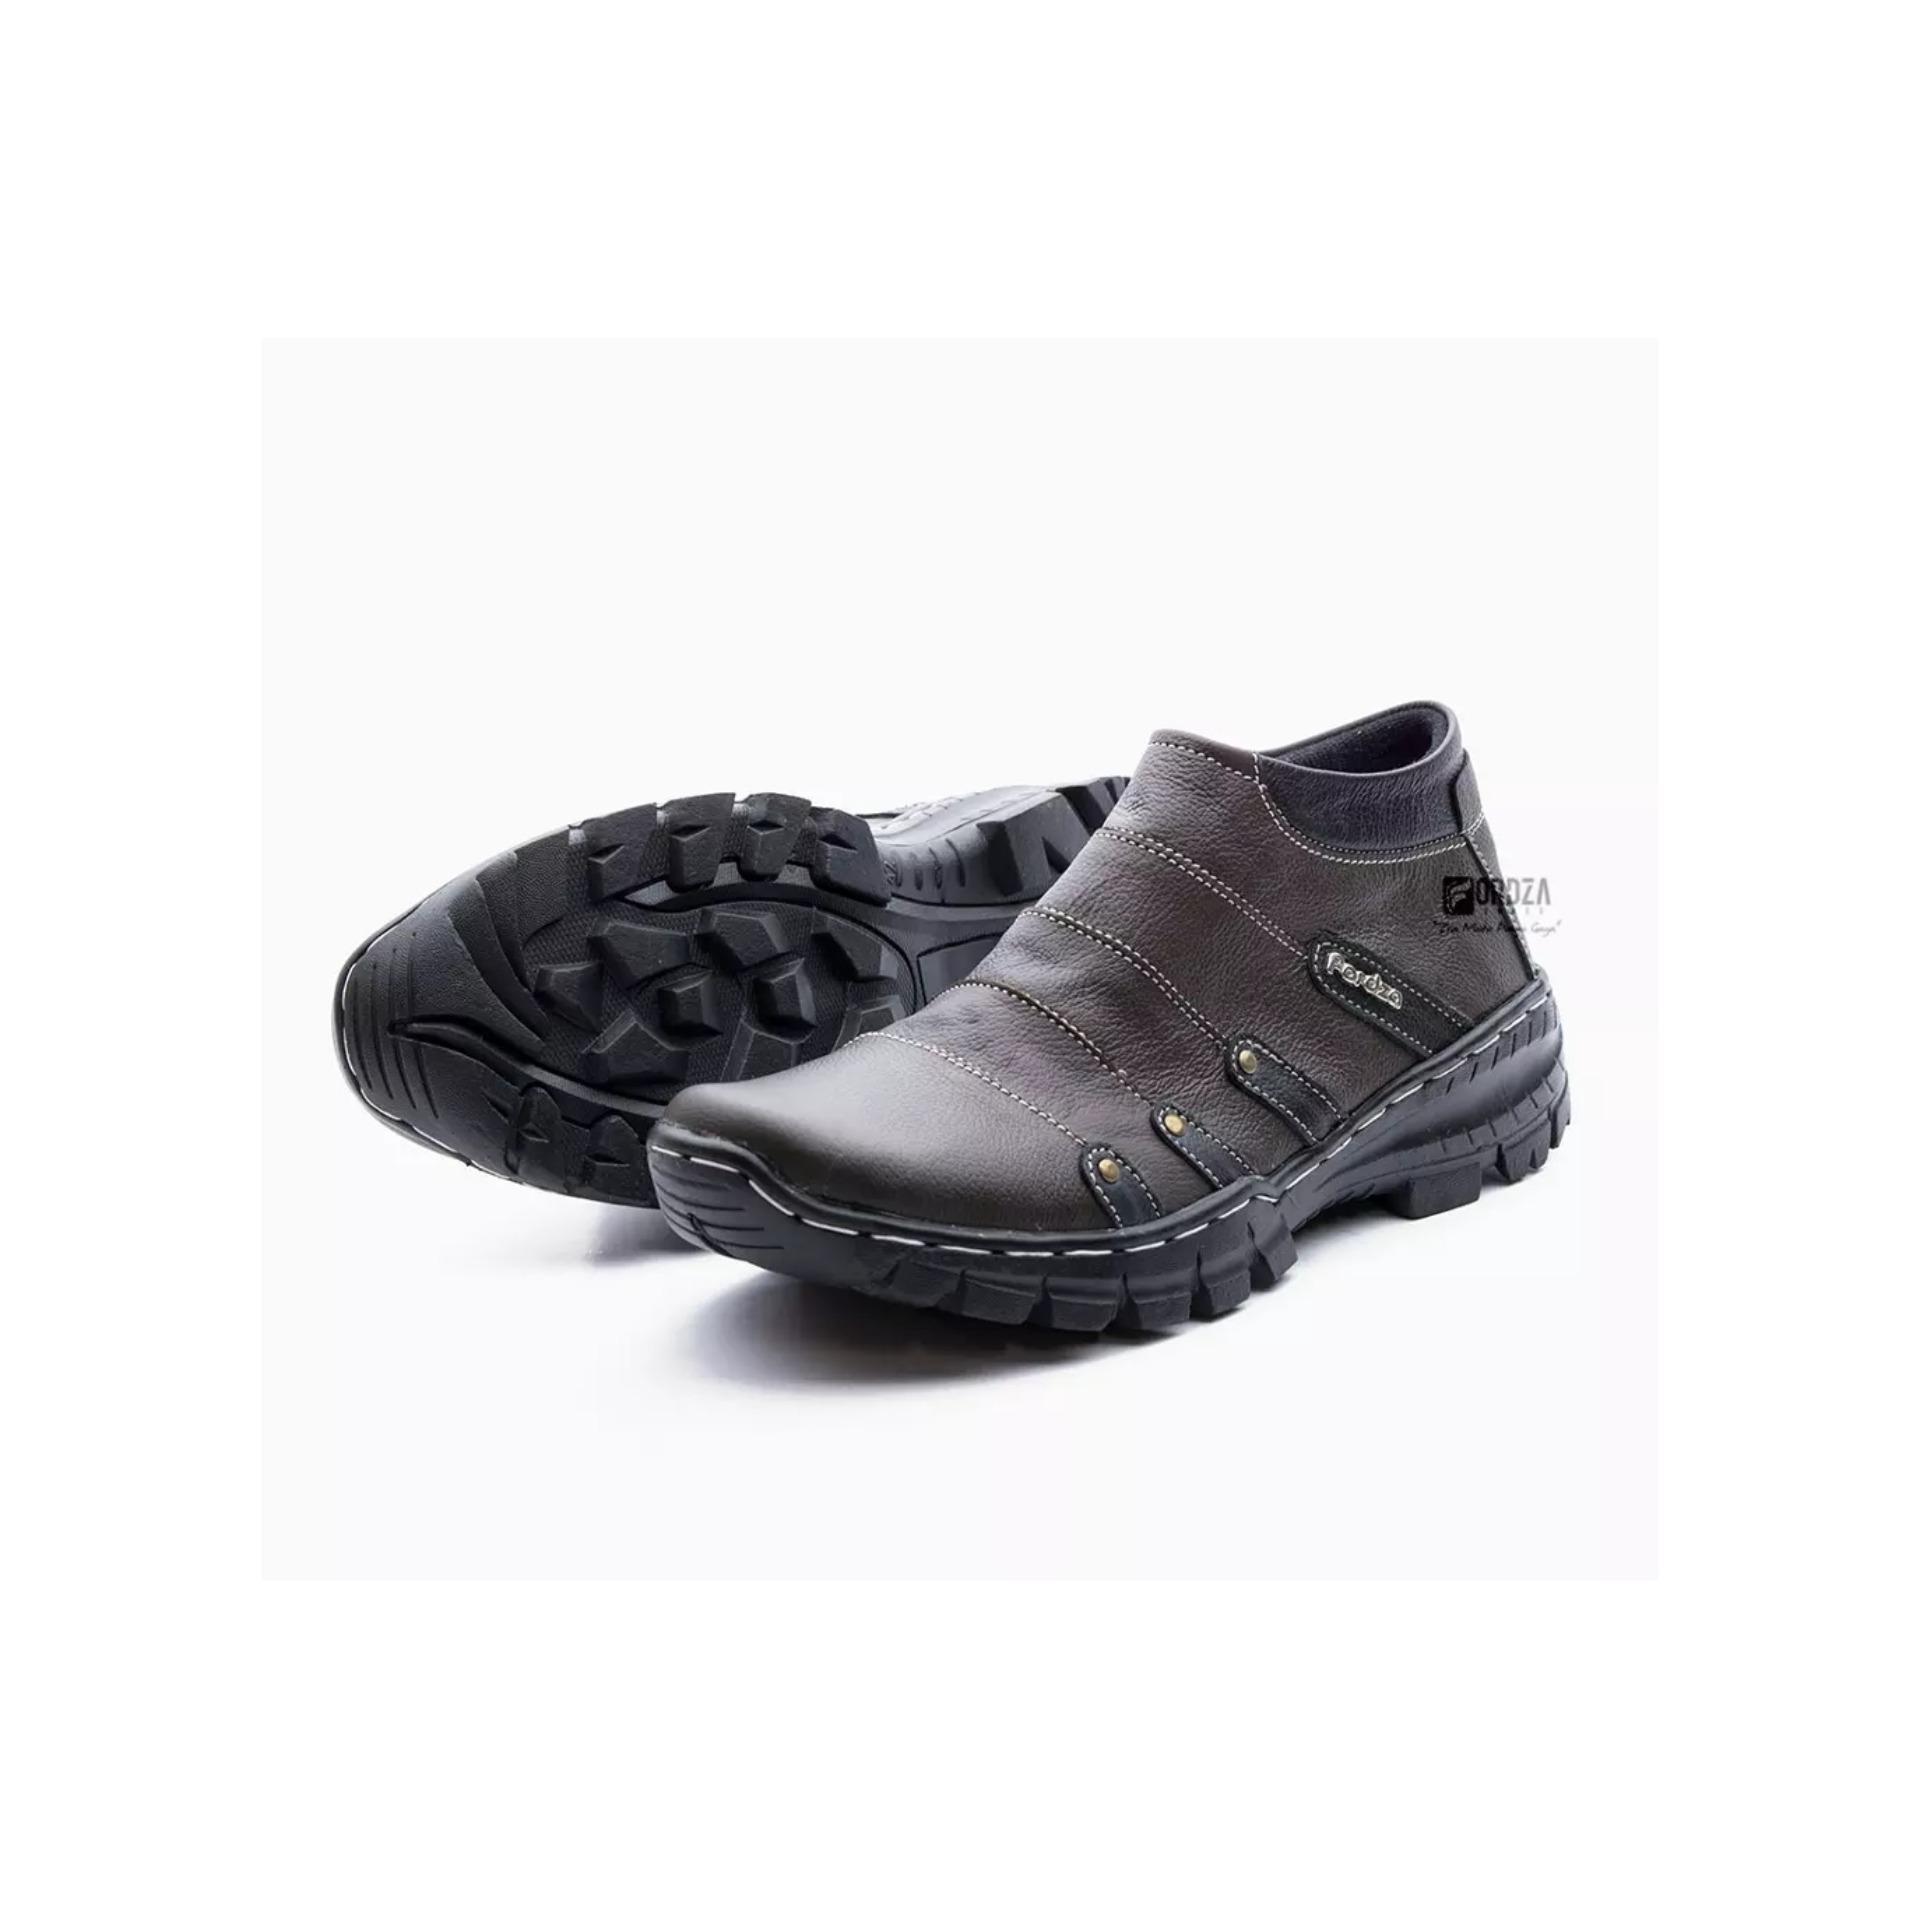 Sepatu Kickers Kerja Formal Boots Kulit Asli Kasual Pria Formal Non Safety  Kerja Kantor SneakersIDR237600. Rp 240.000 32a7d97116